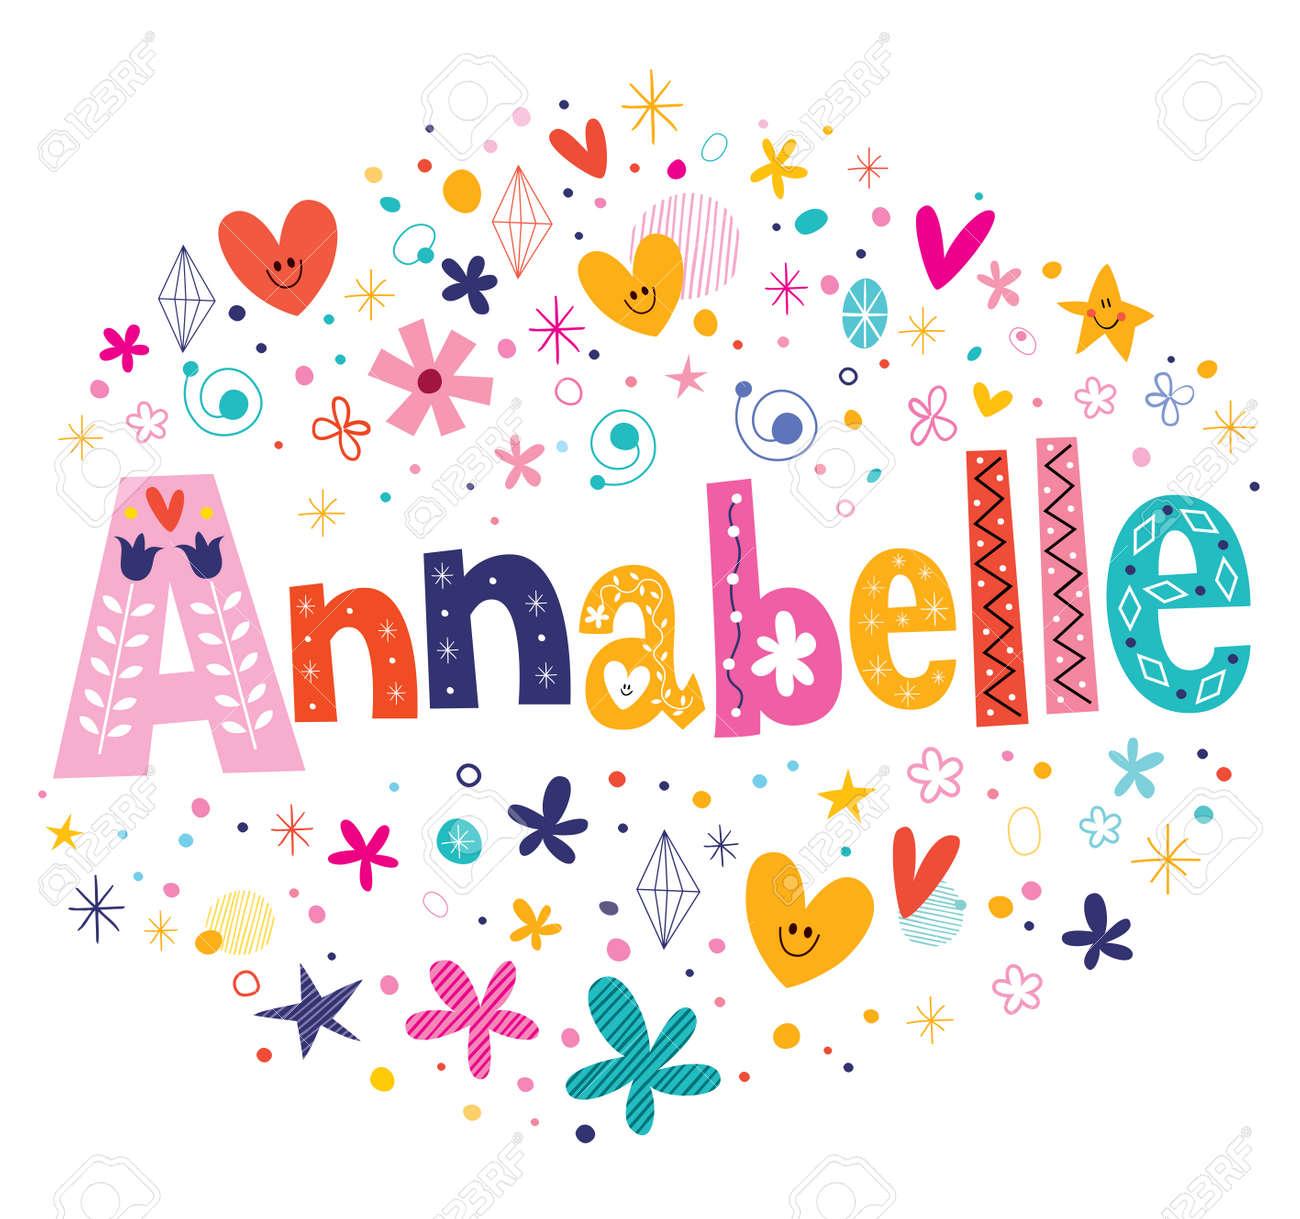 annabelle girls name decorative lettering type design stock vector 57142425